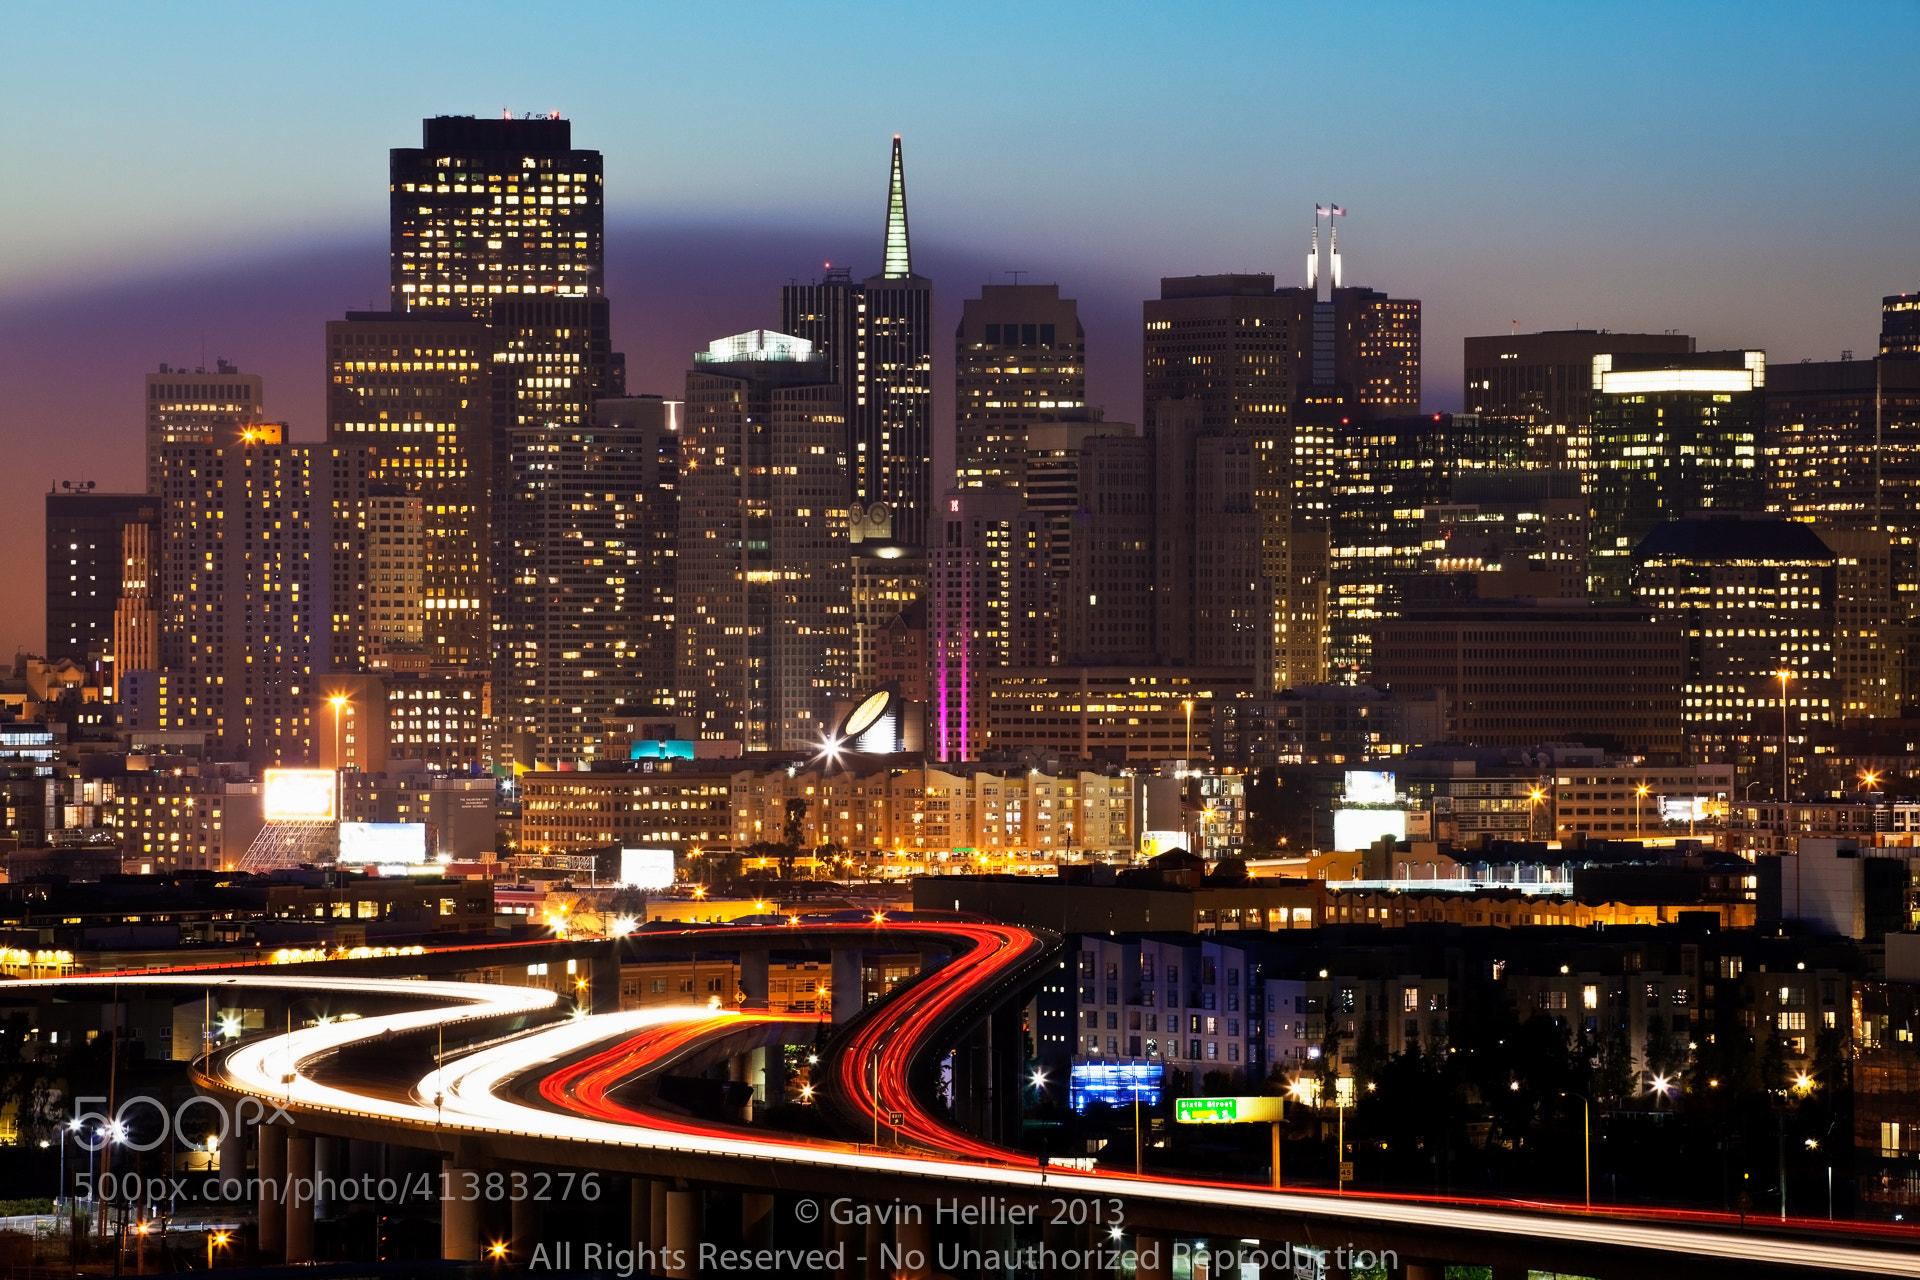 Photograph San Francisco, California, USA by Gavin Hellier on 500px